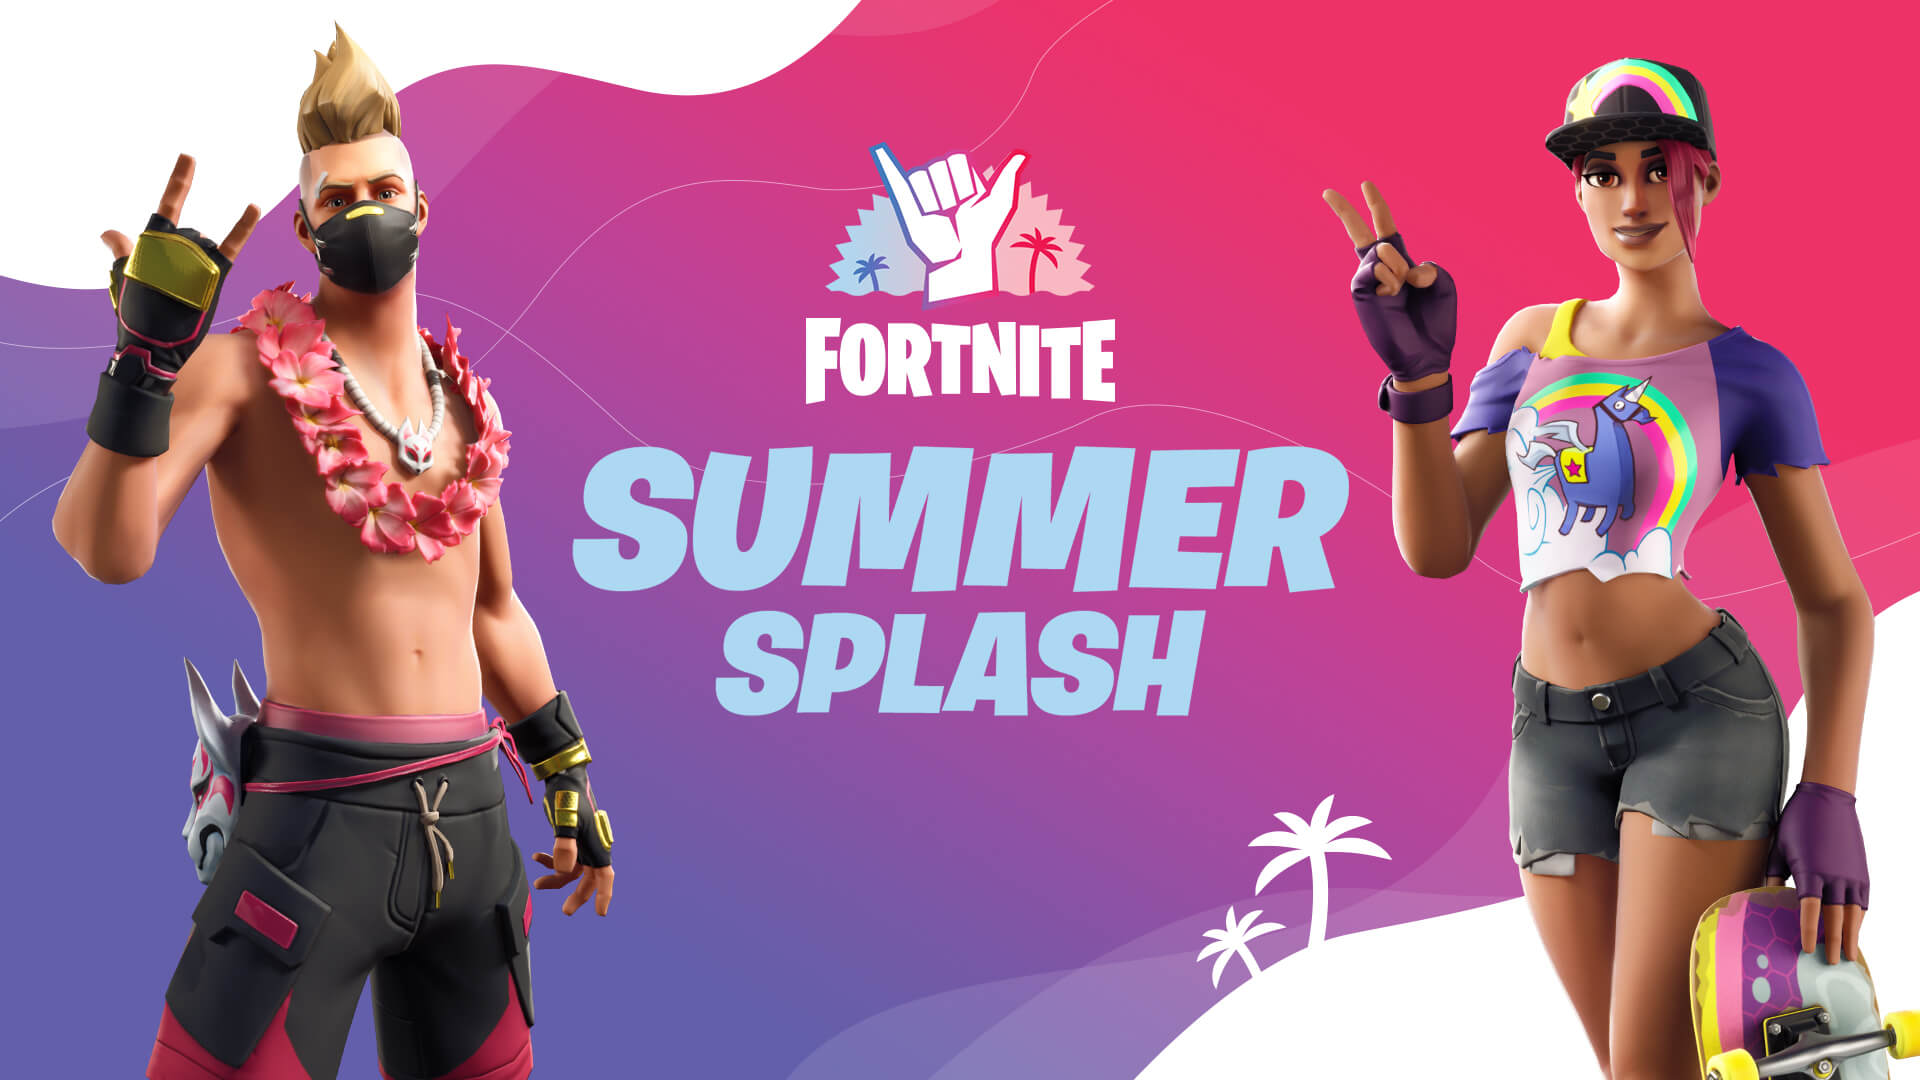 Fortnite Summer Splash 2020 - Fortnite Free Skins